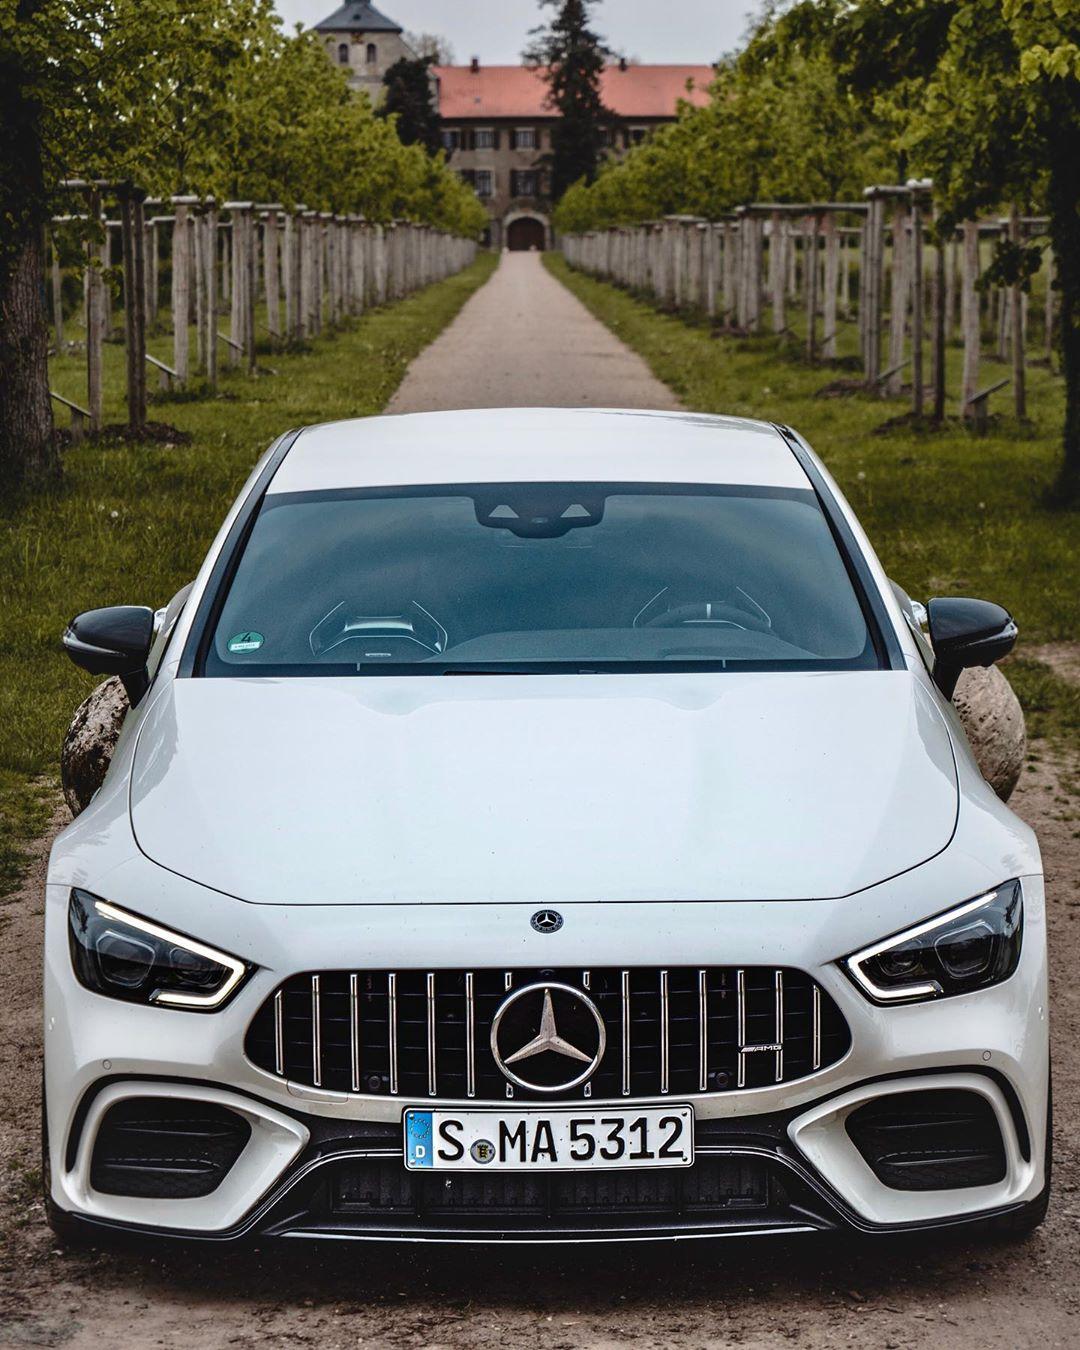 This GT53 4-door definitely has some road presence🤙…beautiful in evening light & stunning at bright sun🤩 @mercedesbenz_de @mercedesamg #mercedesamg #mbsocialcar #mbcars #amg #amggt4door #amggt53 #gt53 #automanntv